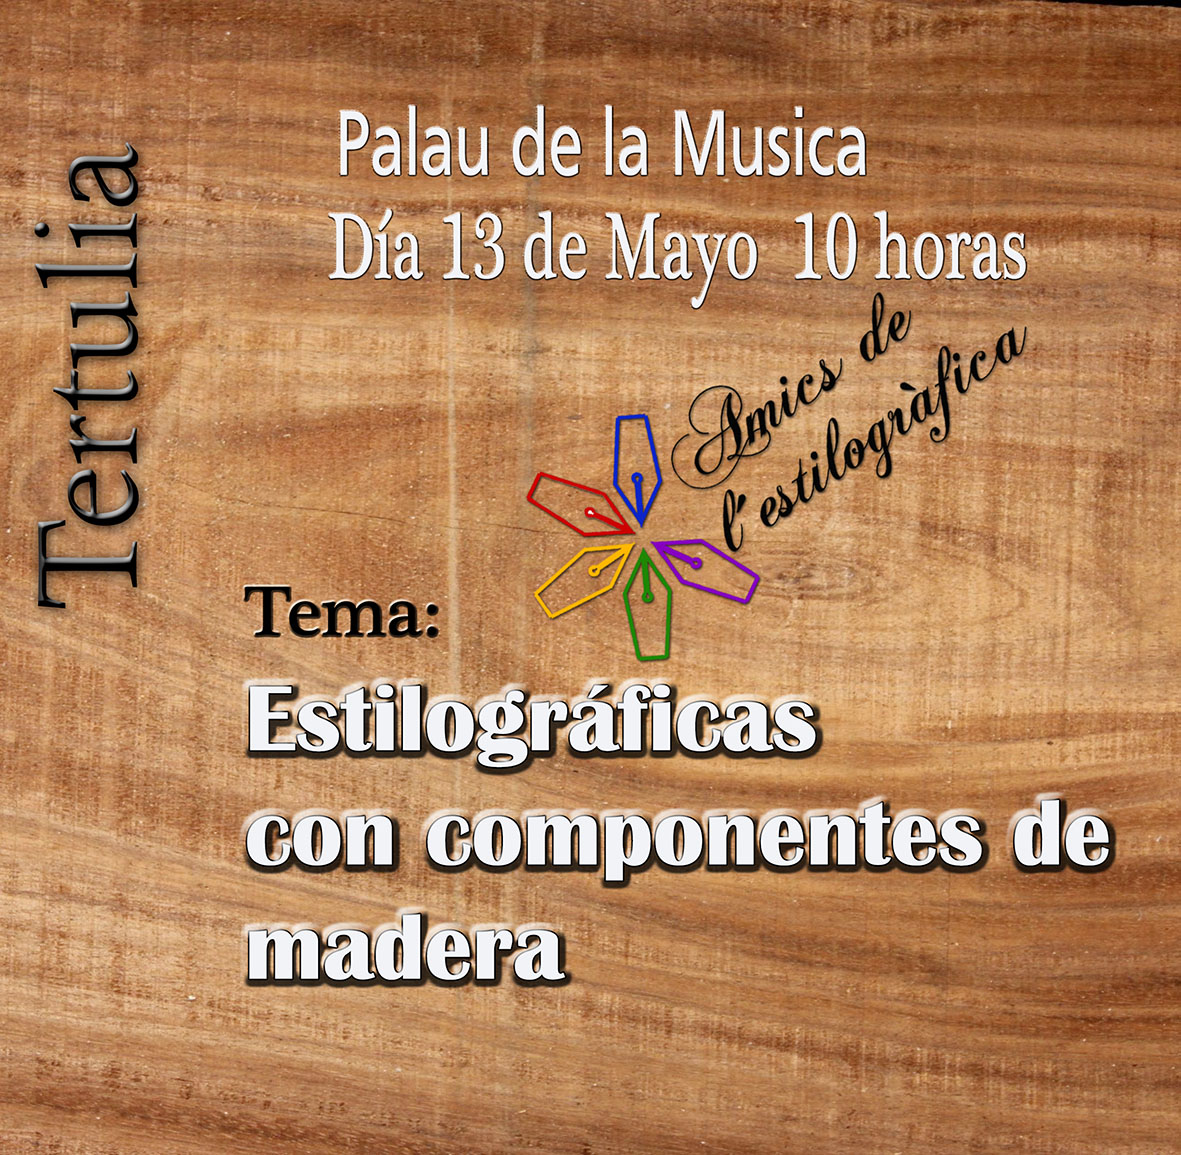 54 TERTULIA DIA 13-5-2017 (ESTILOGRÁFICAS CON COMPONENTES DE MADERA)